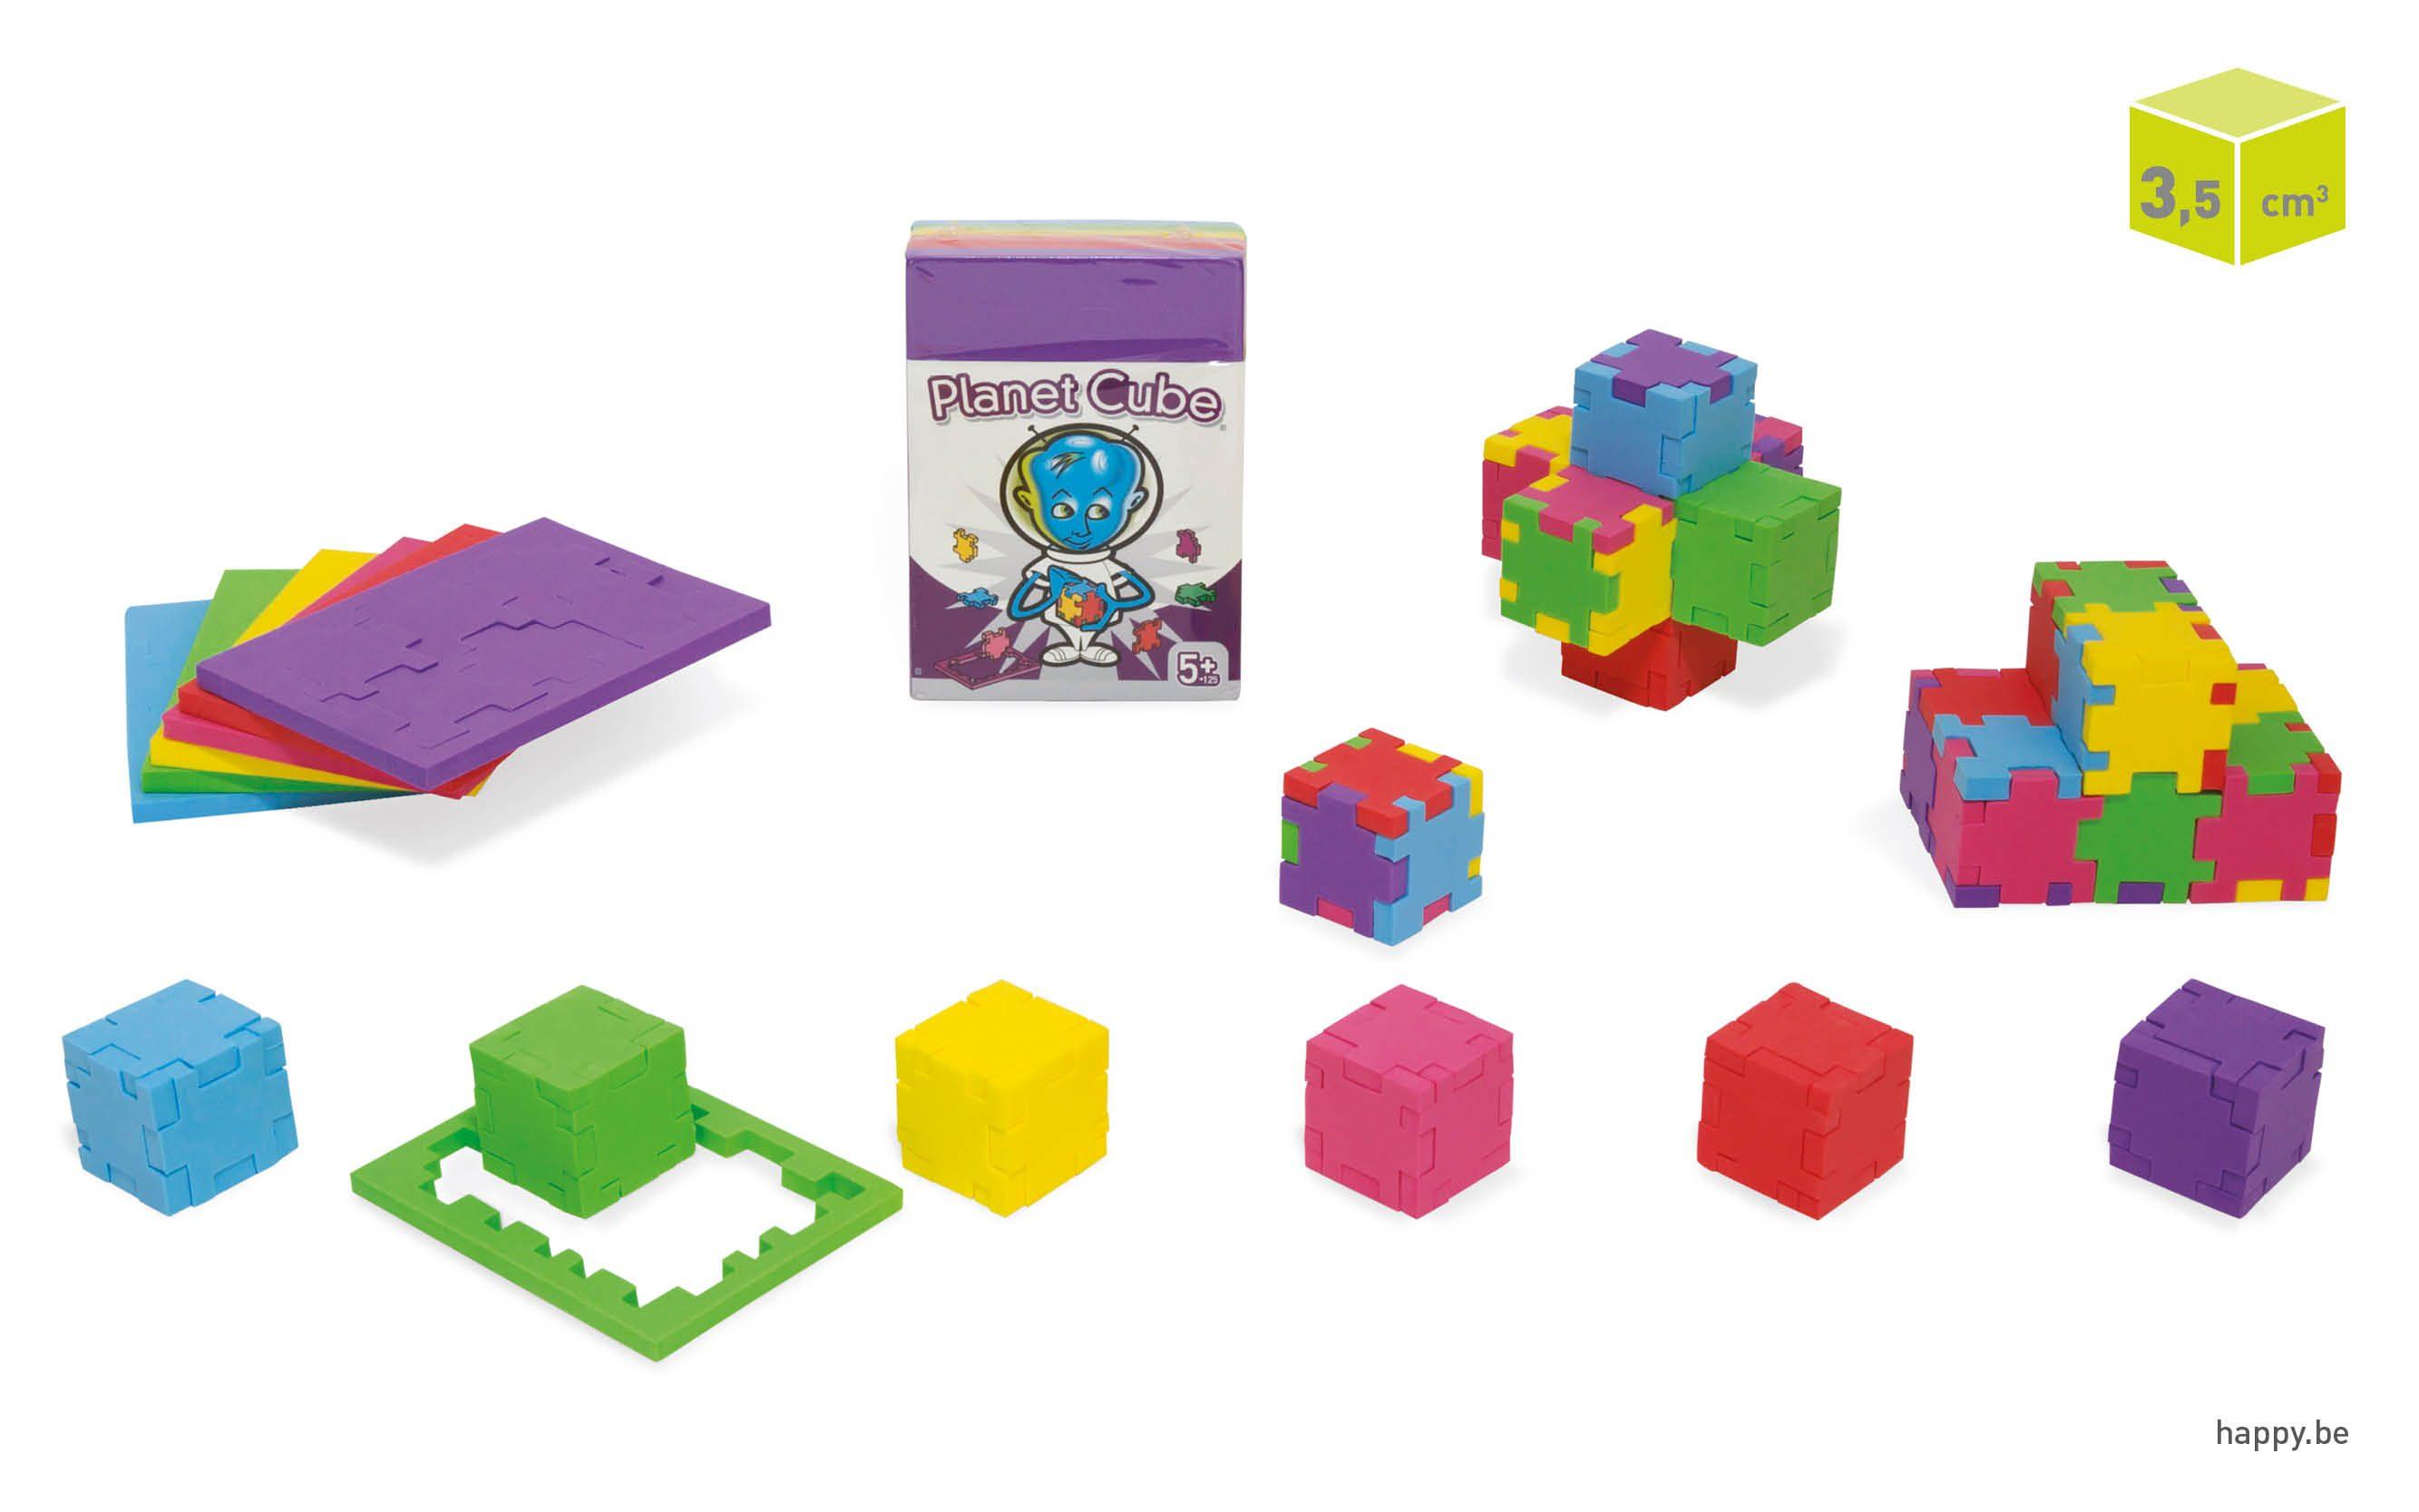 Happy_PlanetCube_6cubes_combinations